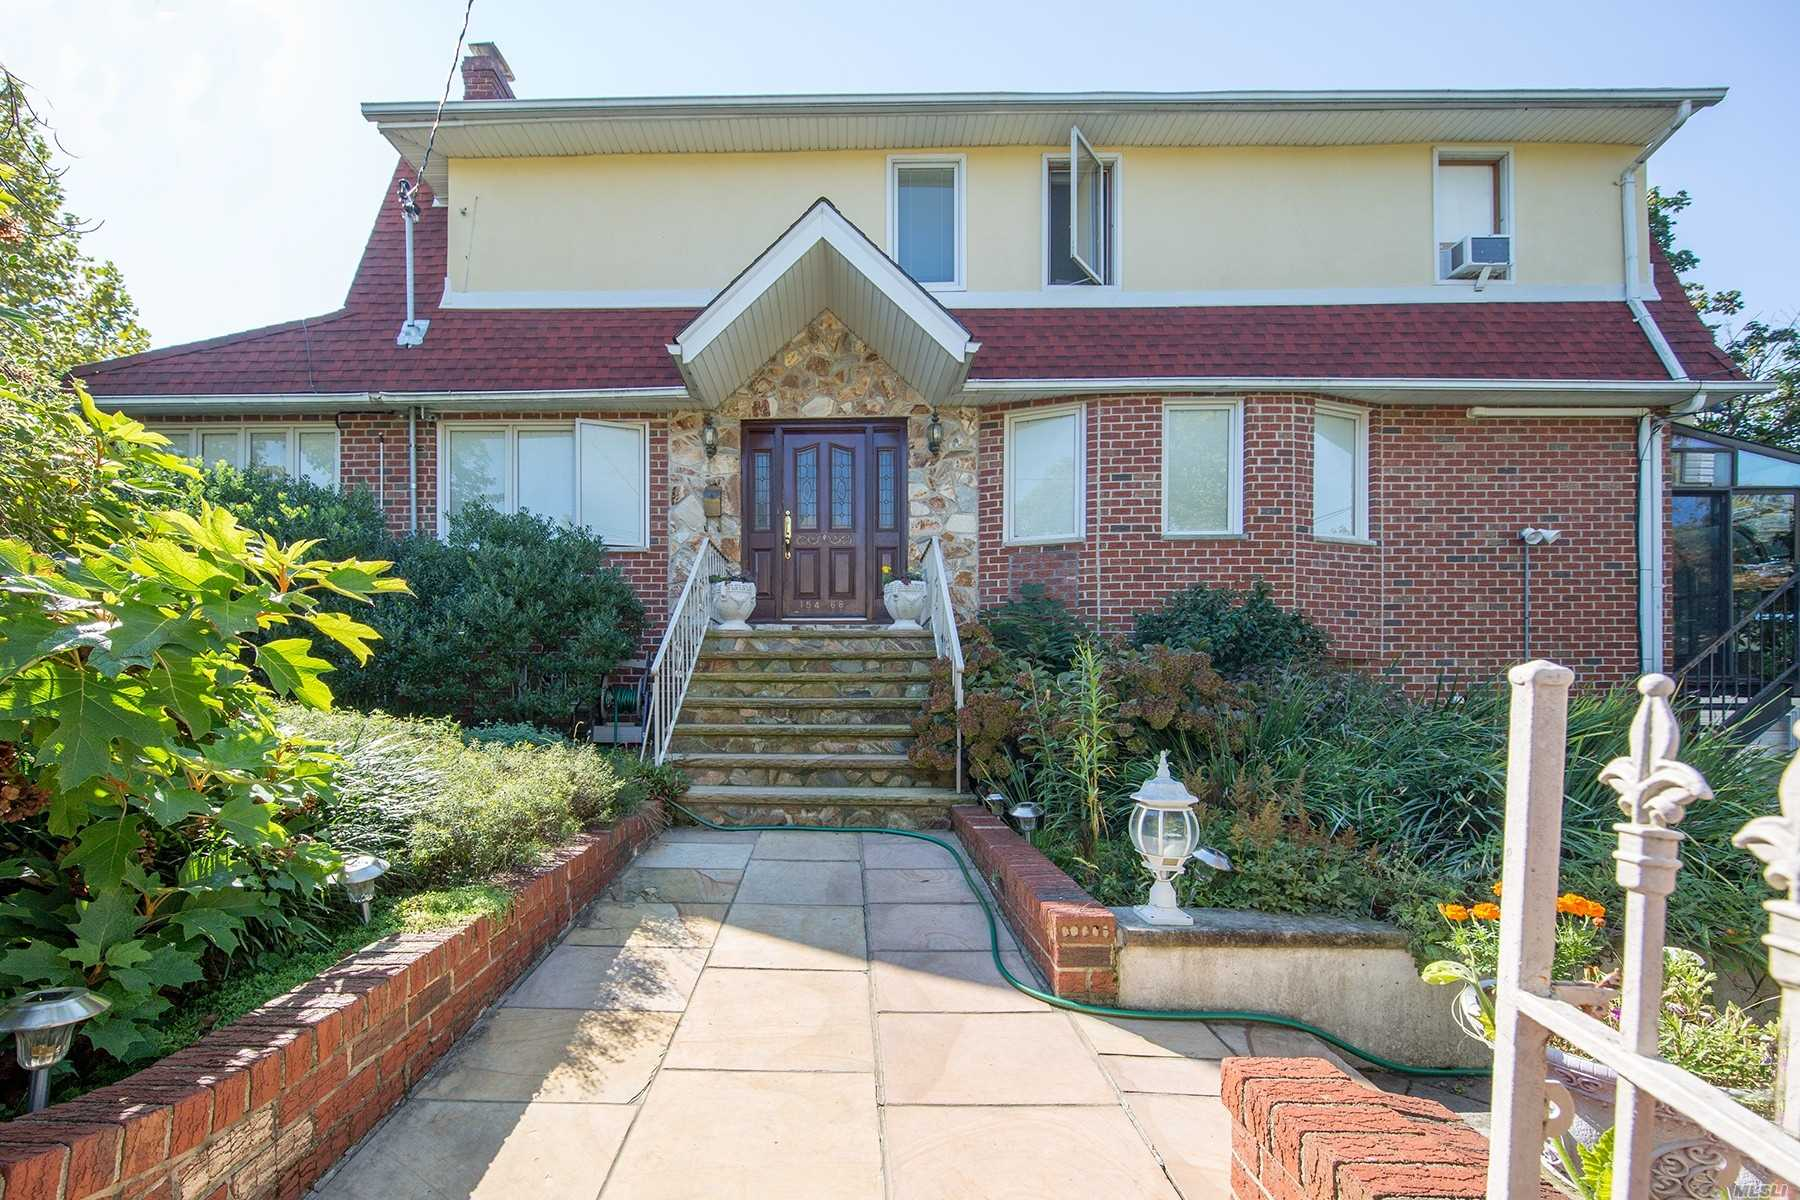 Property for sale at 154-68 10th Avenue, Whitestone NY 11357, Whitestone,  New York 11357